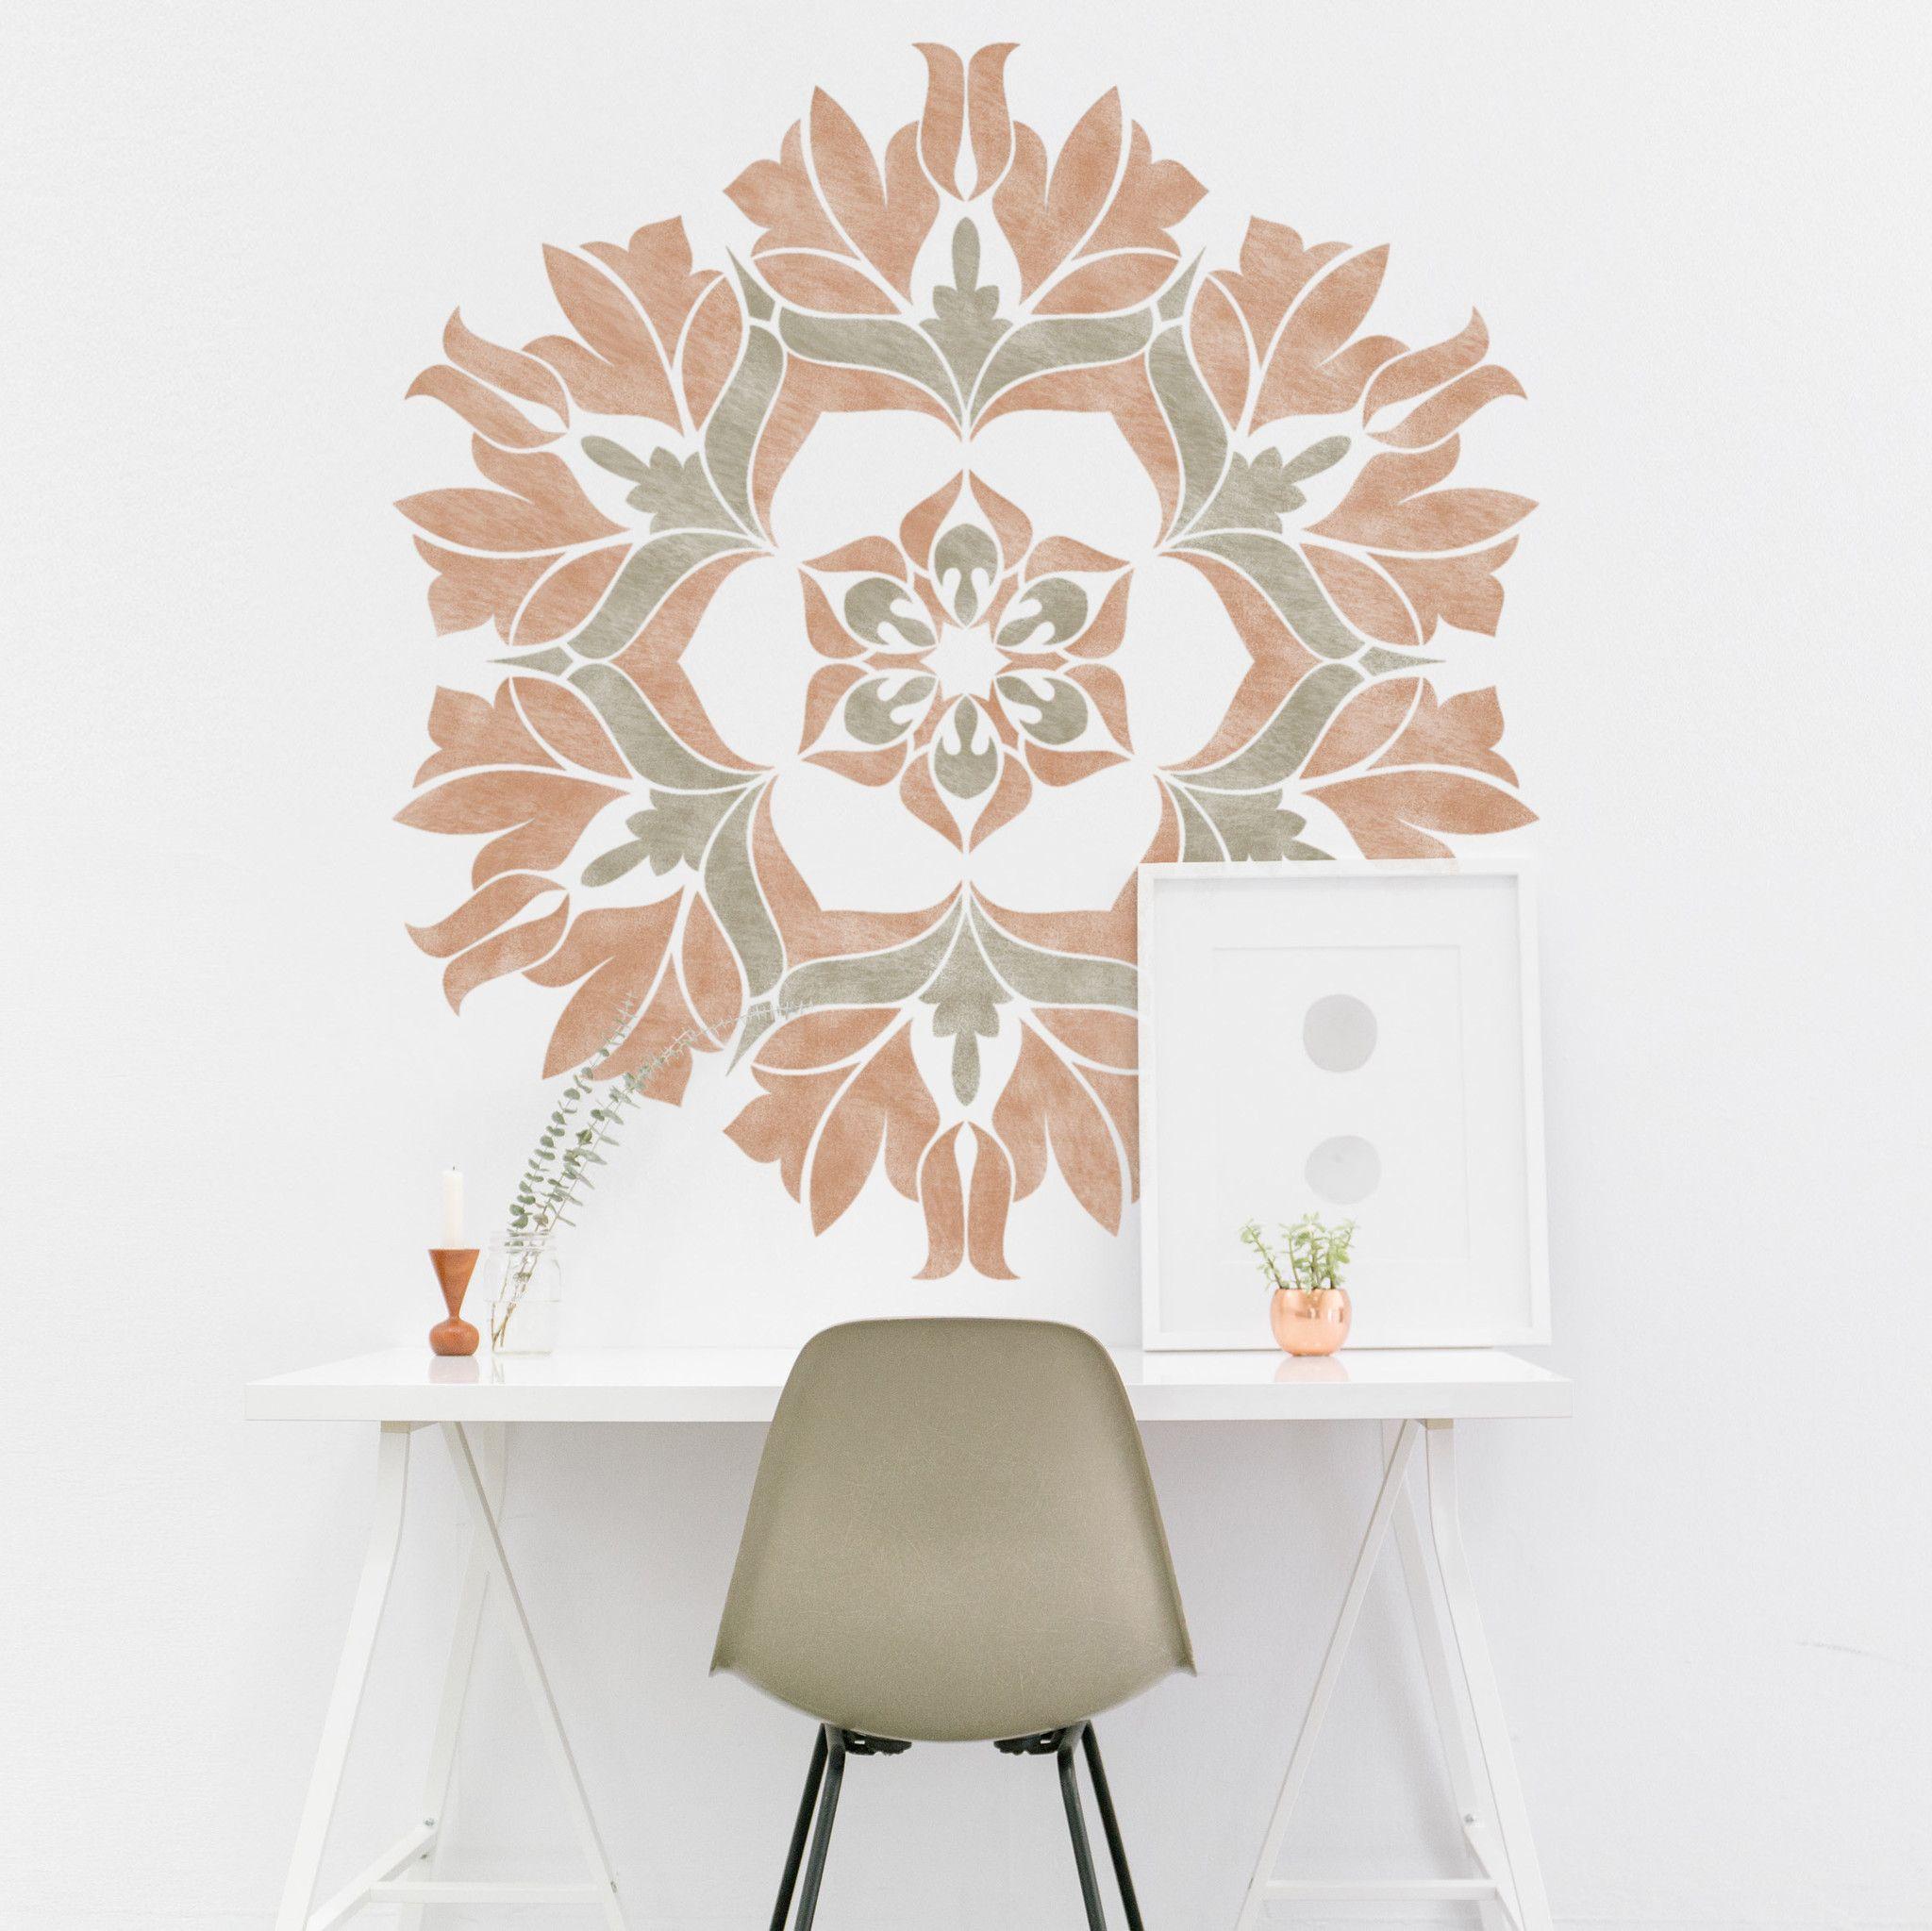 mandala painting stencil geometric stencil for diy decor projects rh pinterest com